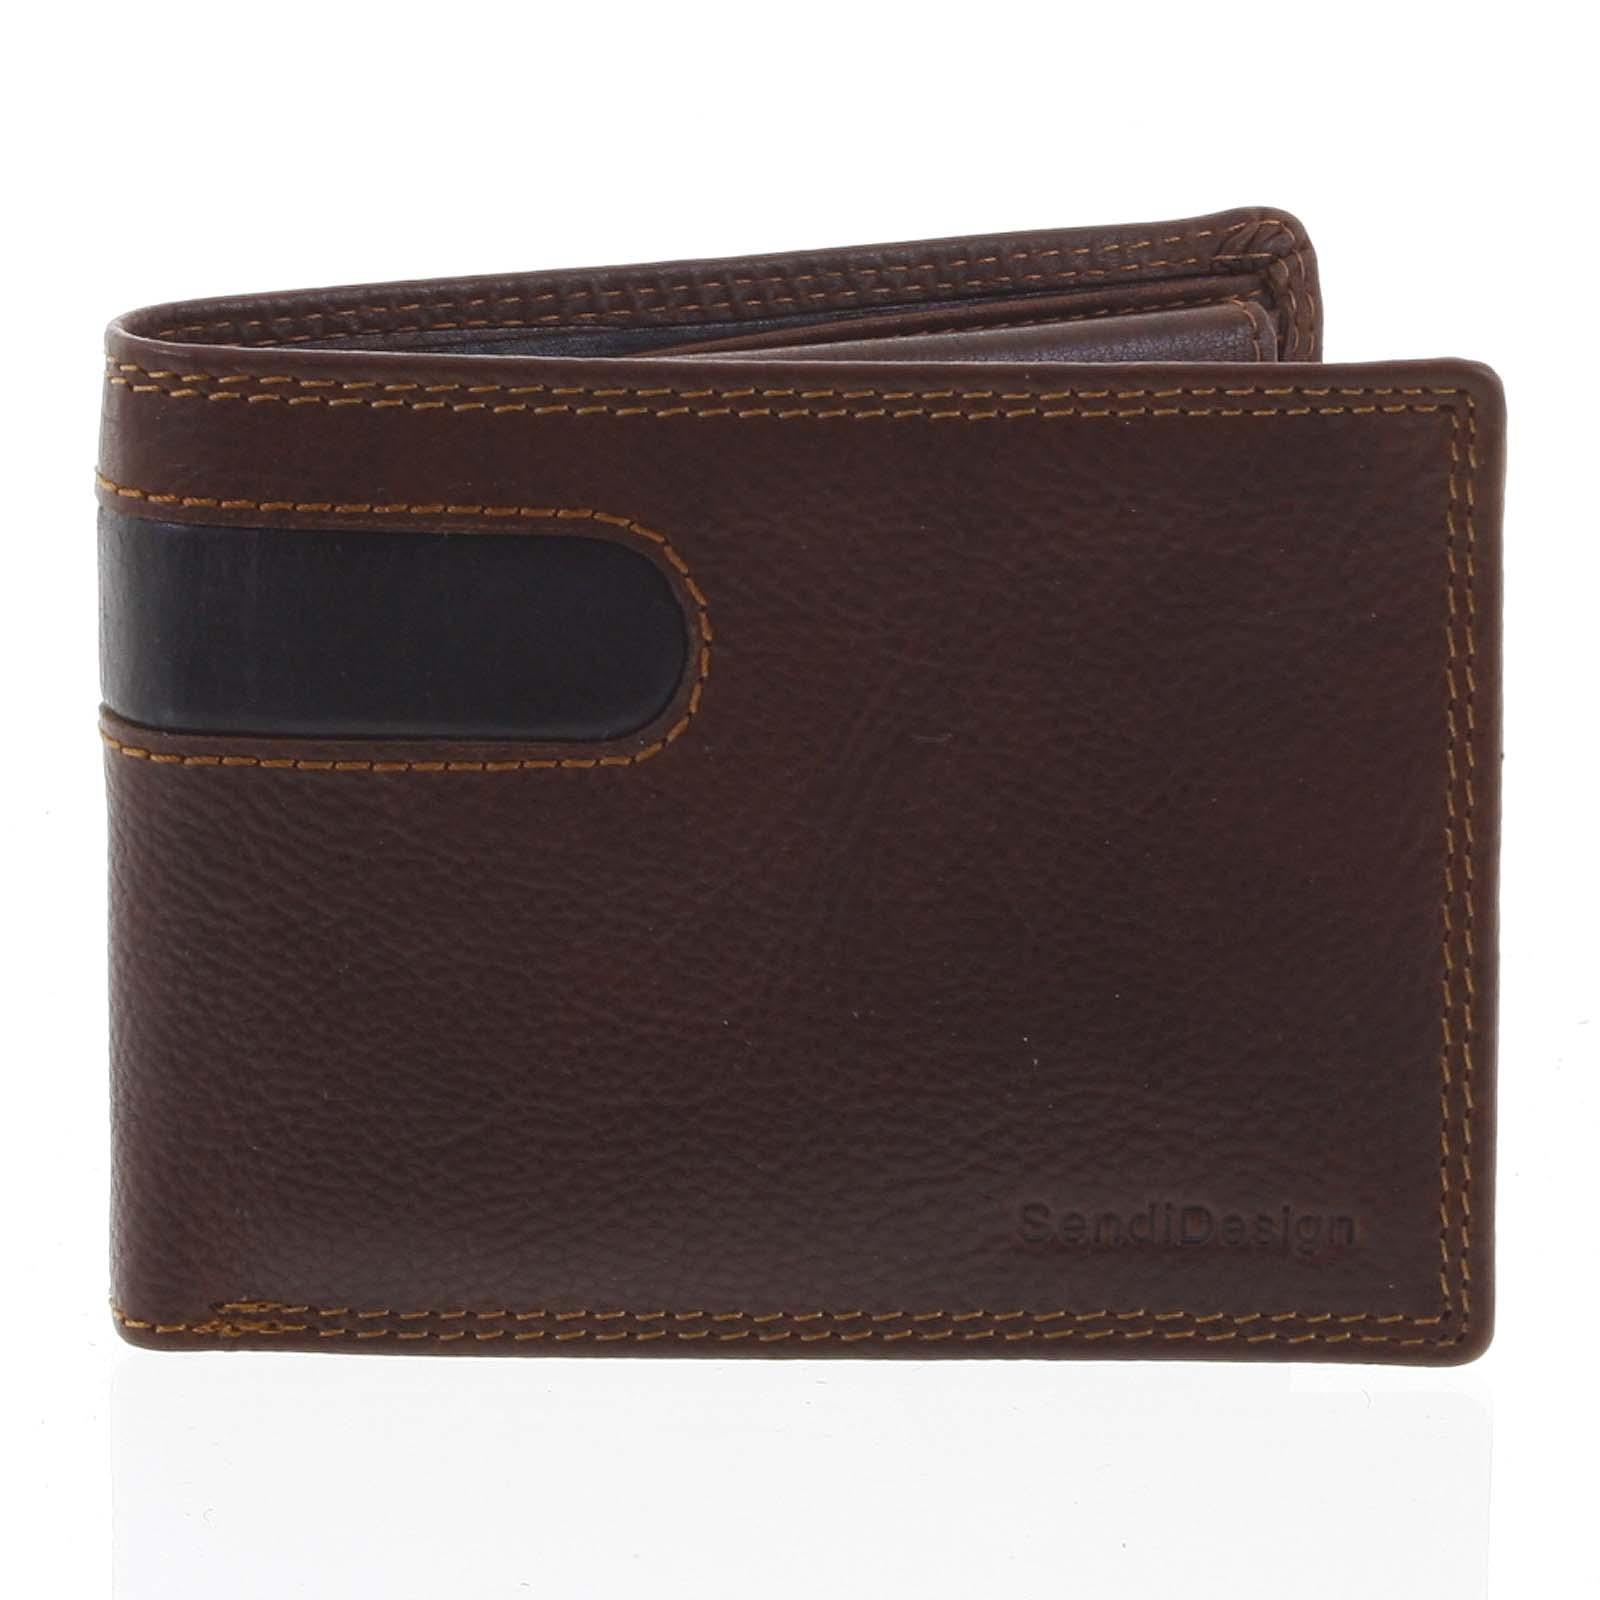 Pánská kožená peněženka tenká hnědá - SendiDesign Elohi